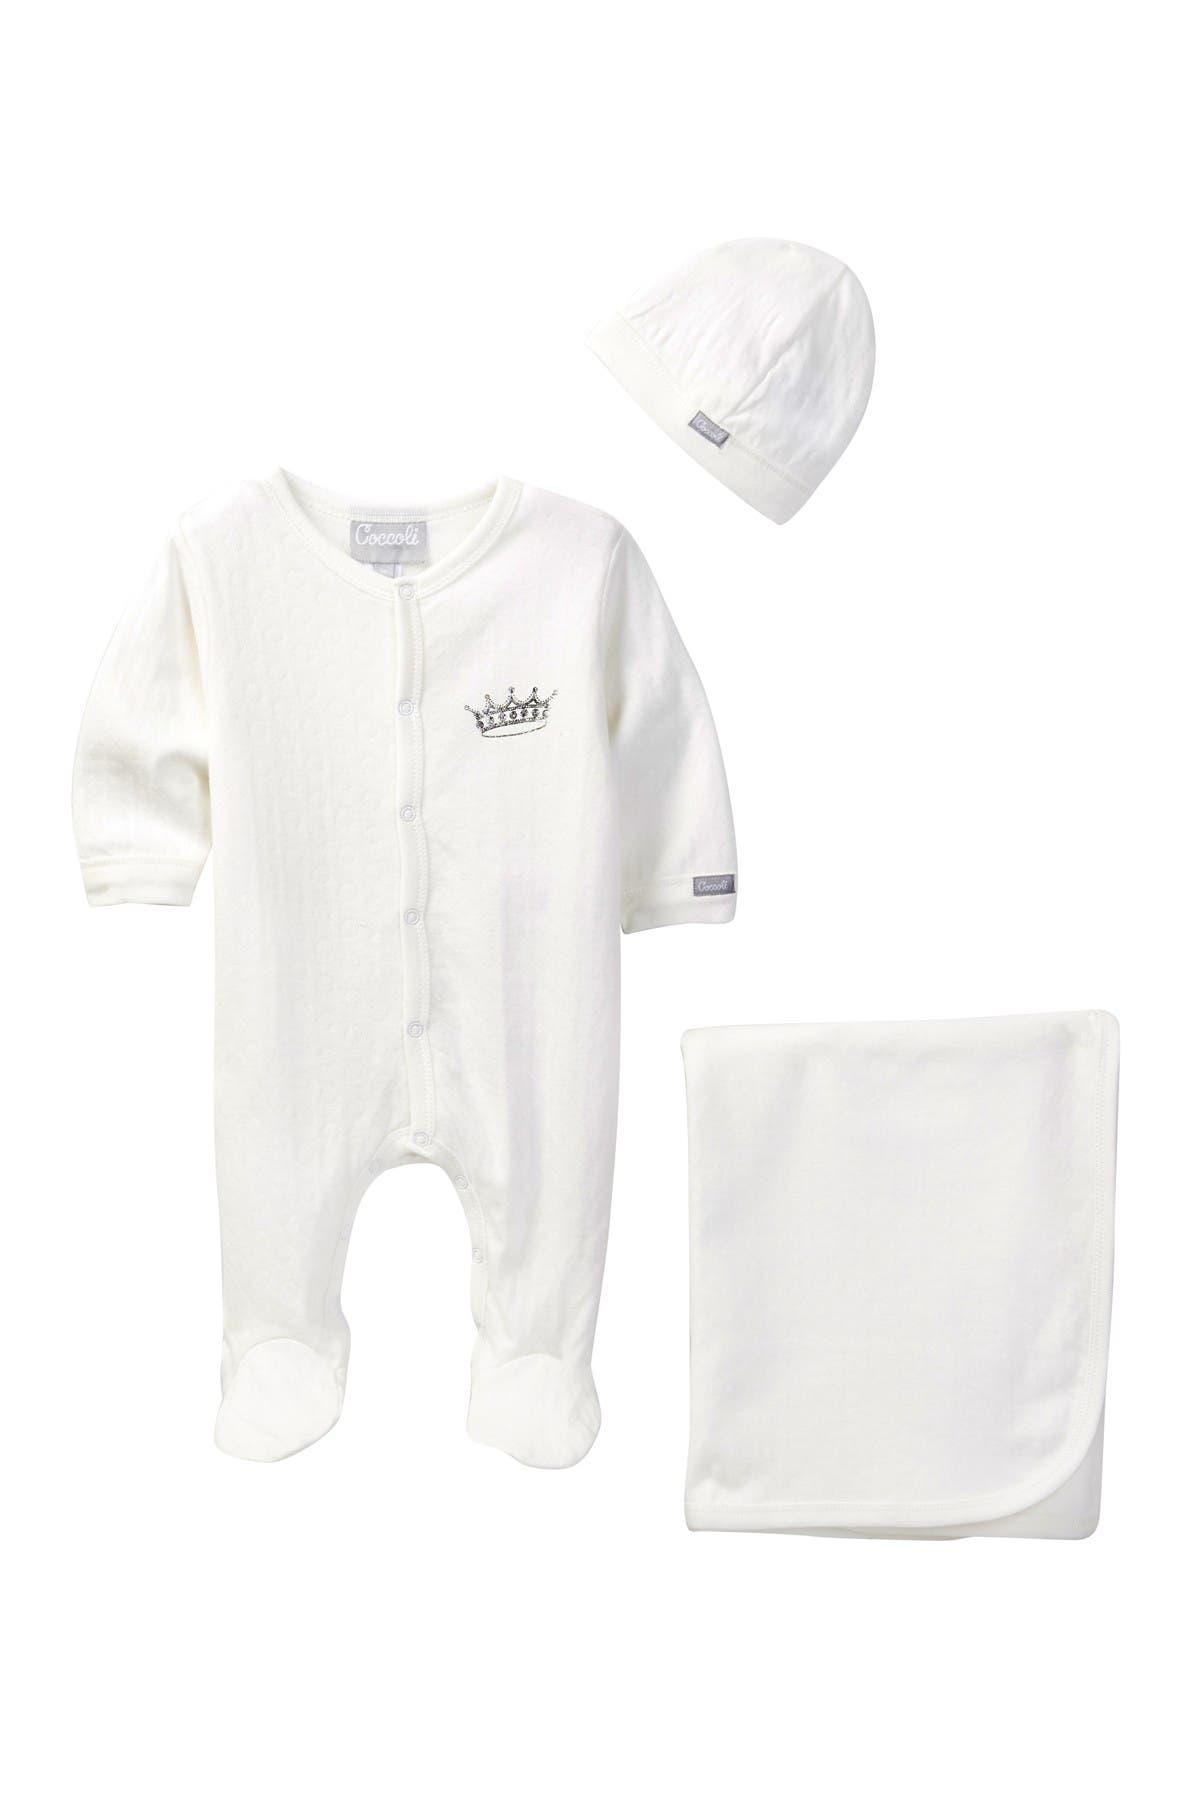 Image of Coccoli Footie, Cap, & Blanket Set